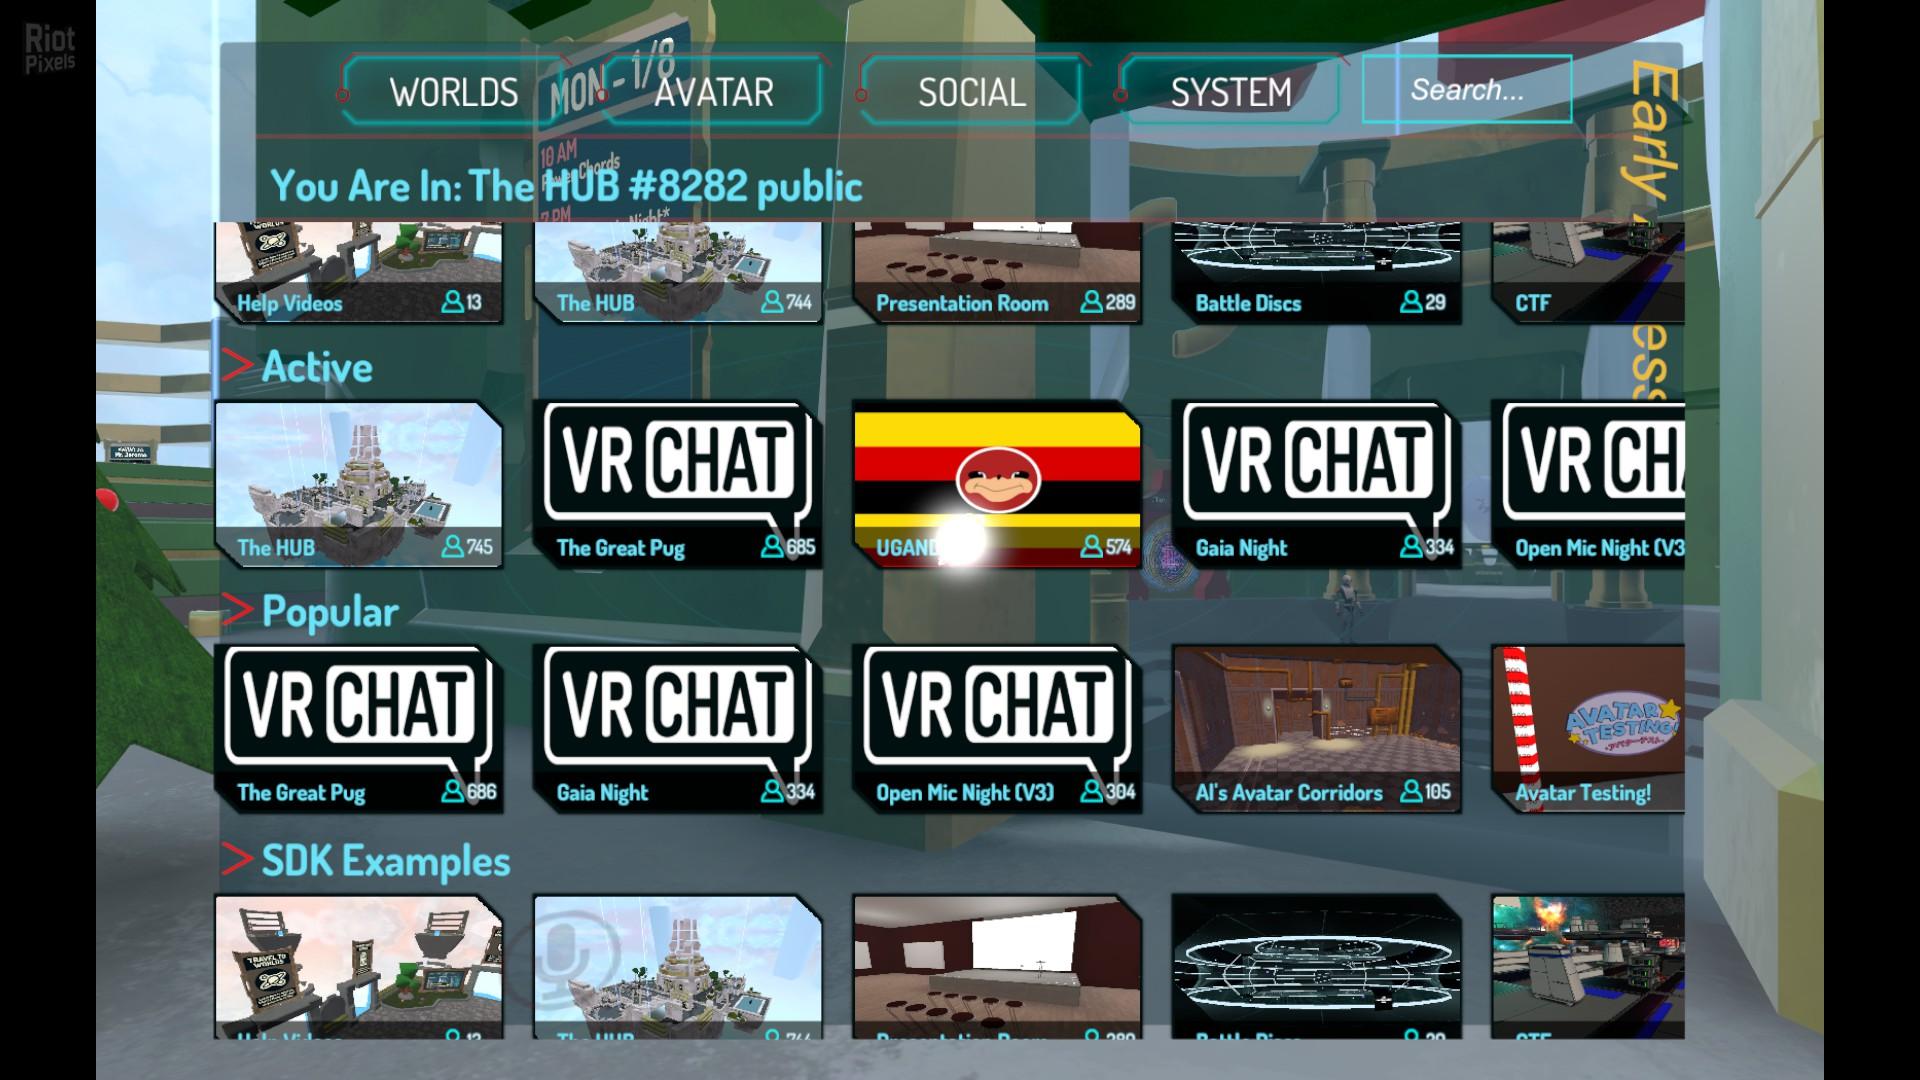 VRChat - game screenshots at Riot Pixels, images